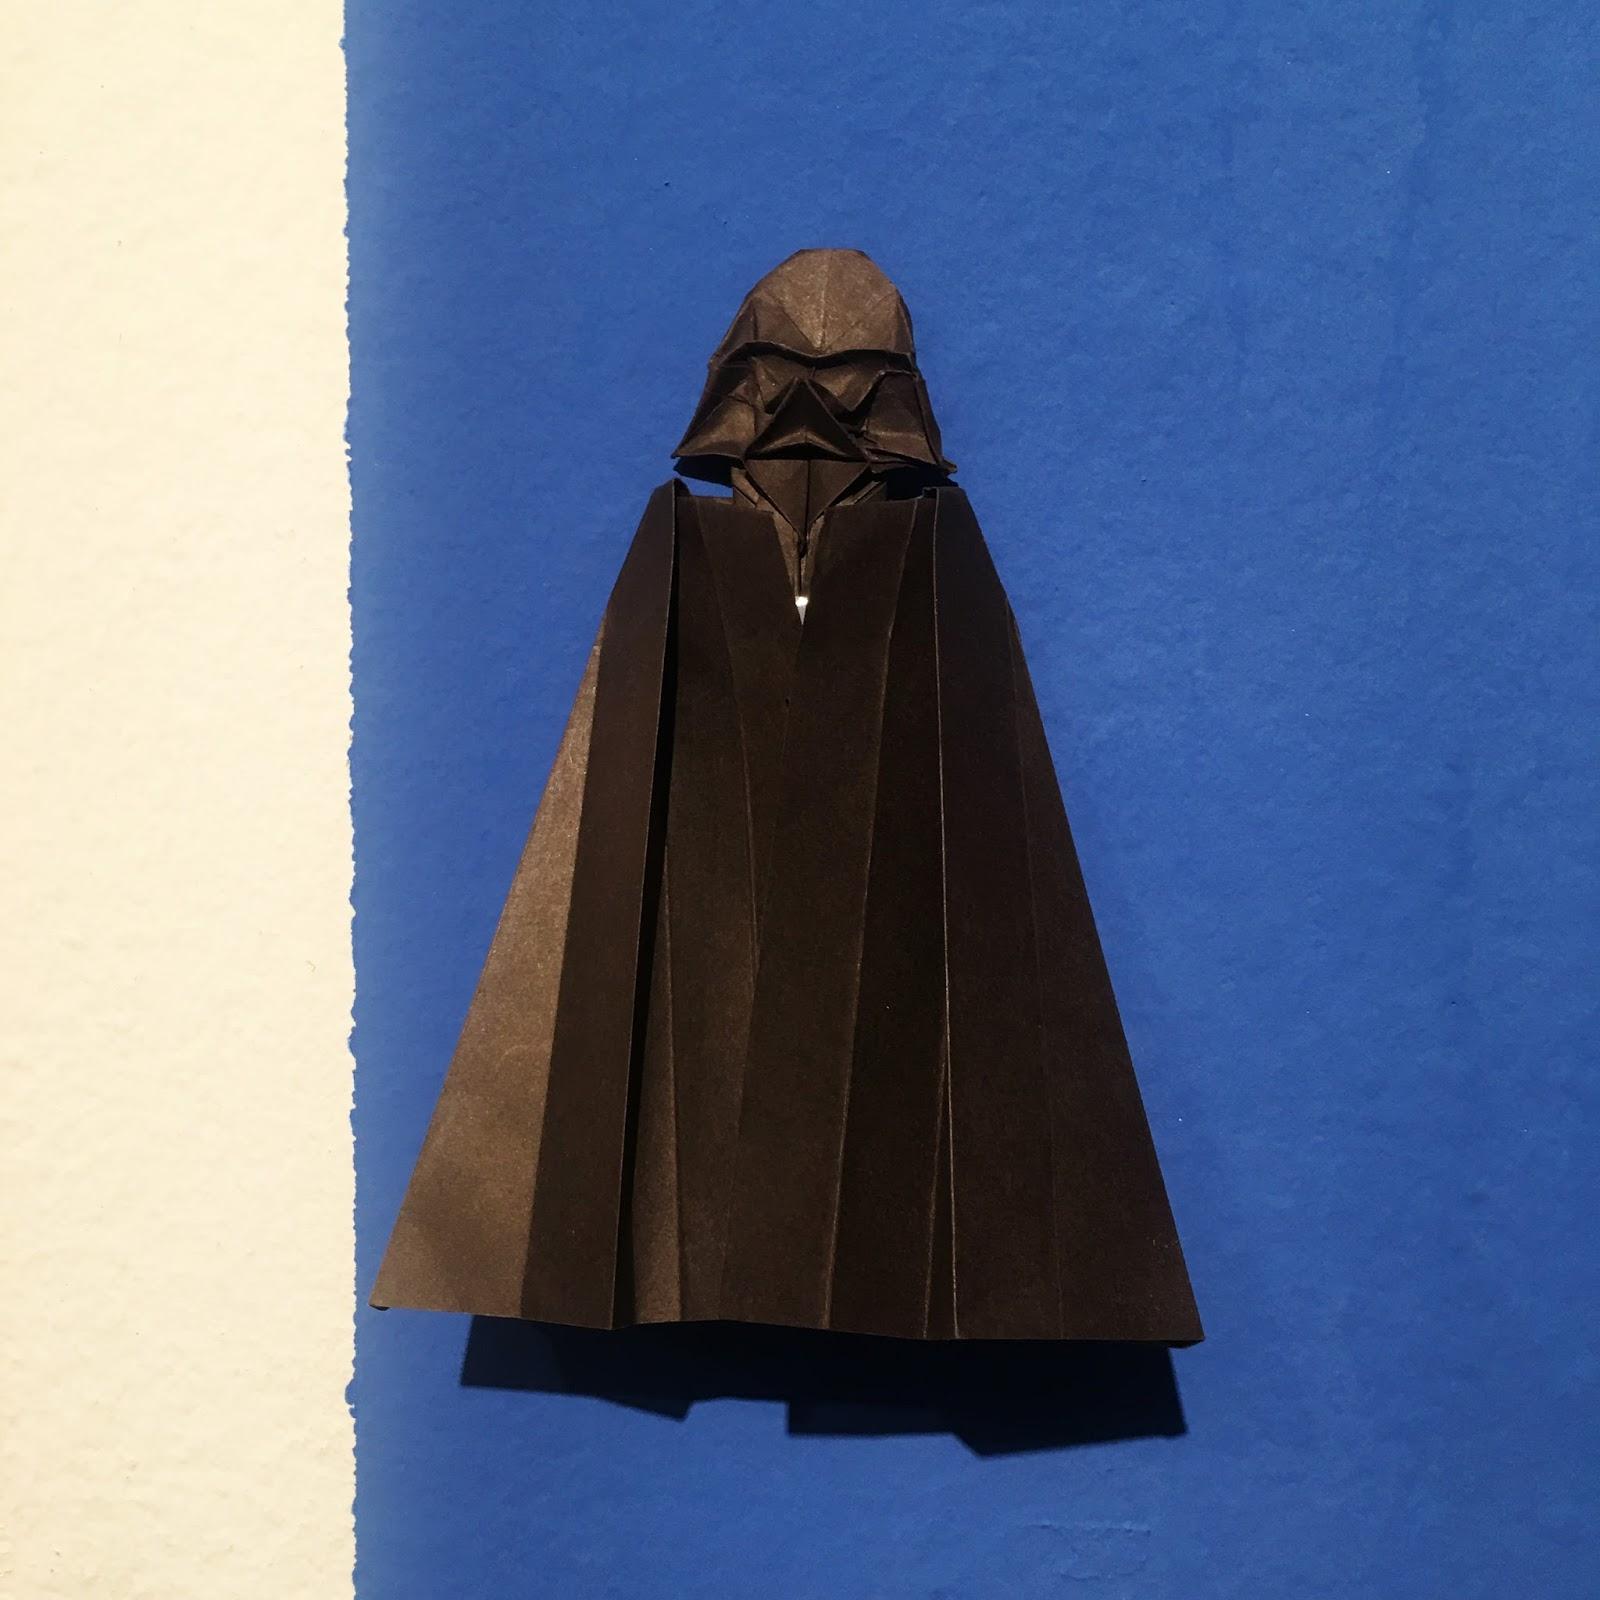 Darth Vader de papel Origami Ana Sofía Casaverde